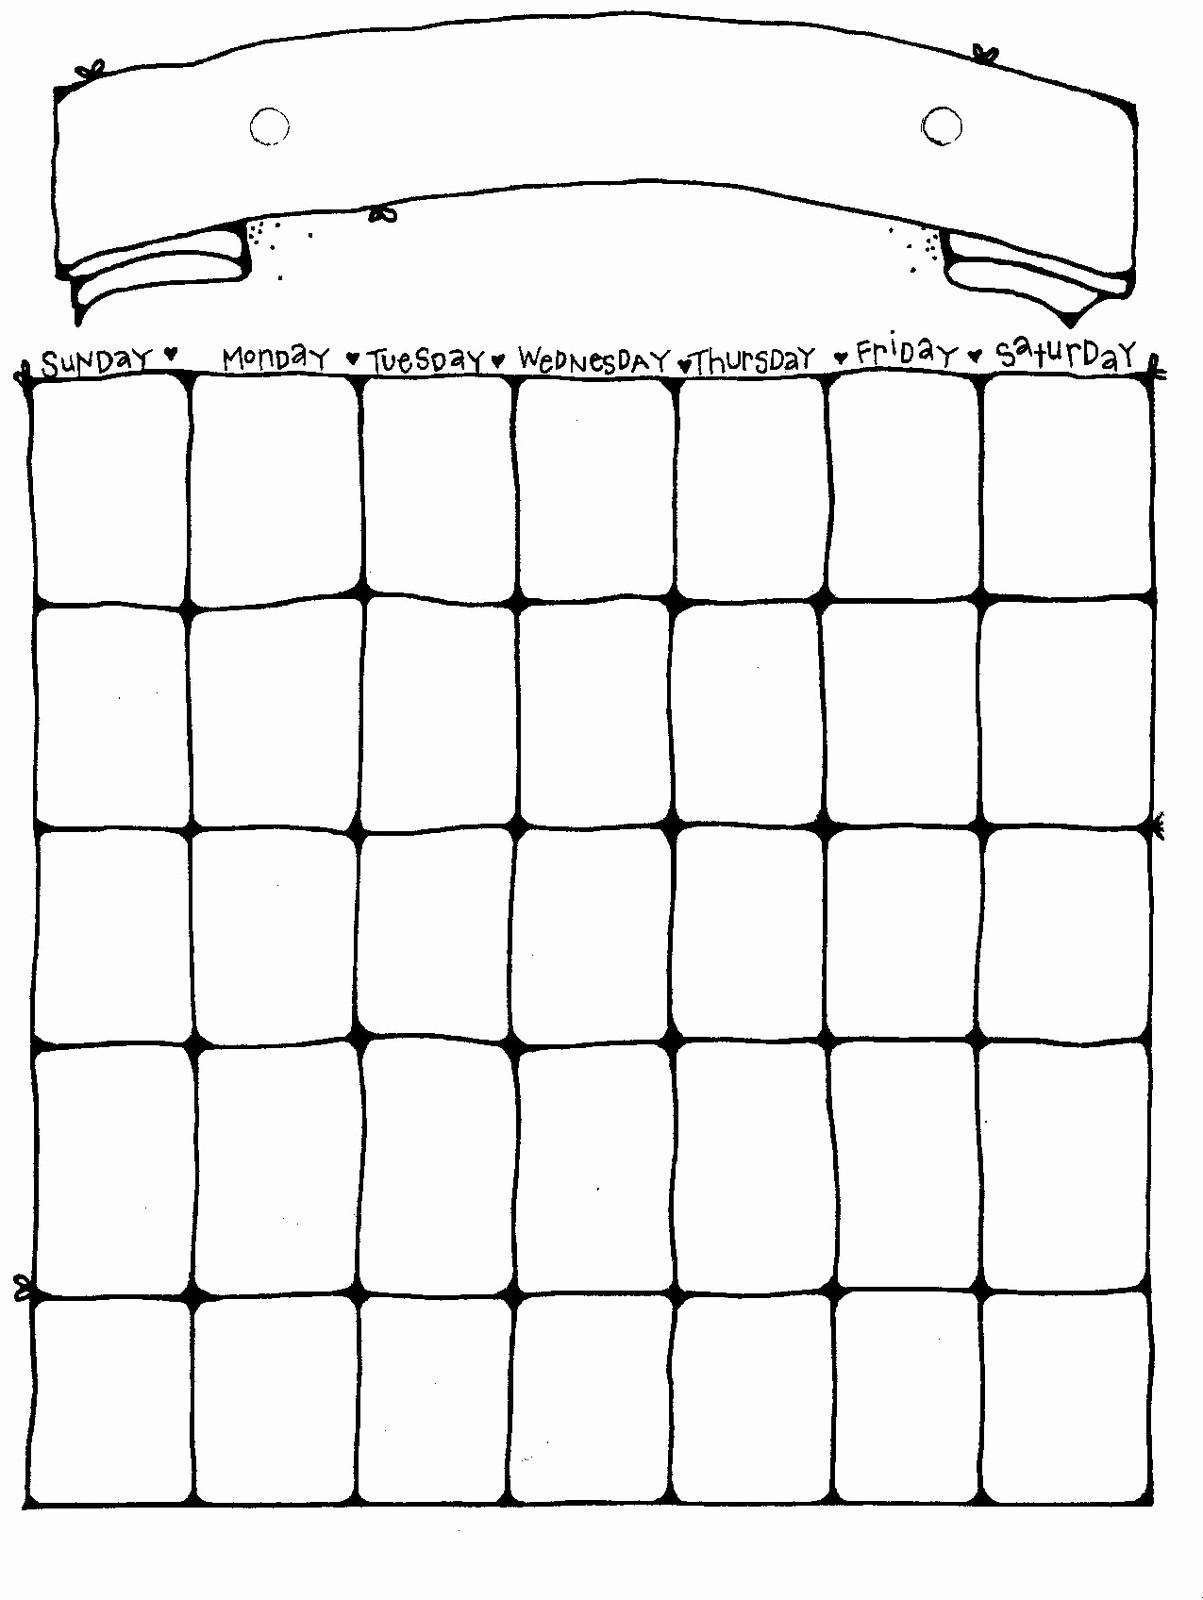 Printable Blank Monthly Calendar Template Fresh 14 Blank Activity Calendar Template Printable